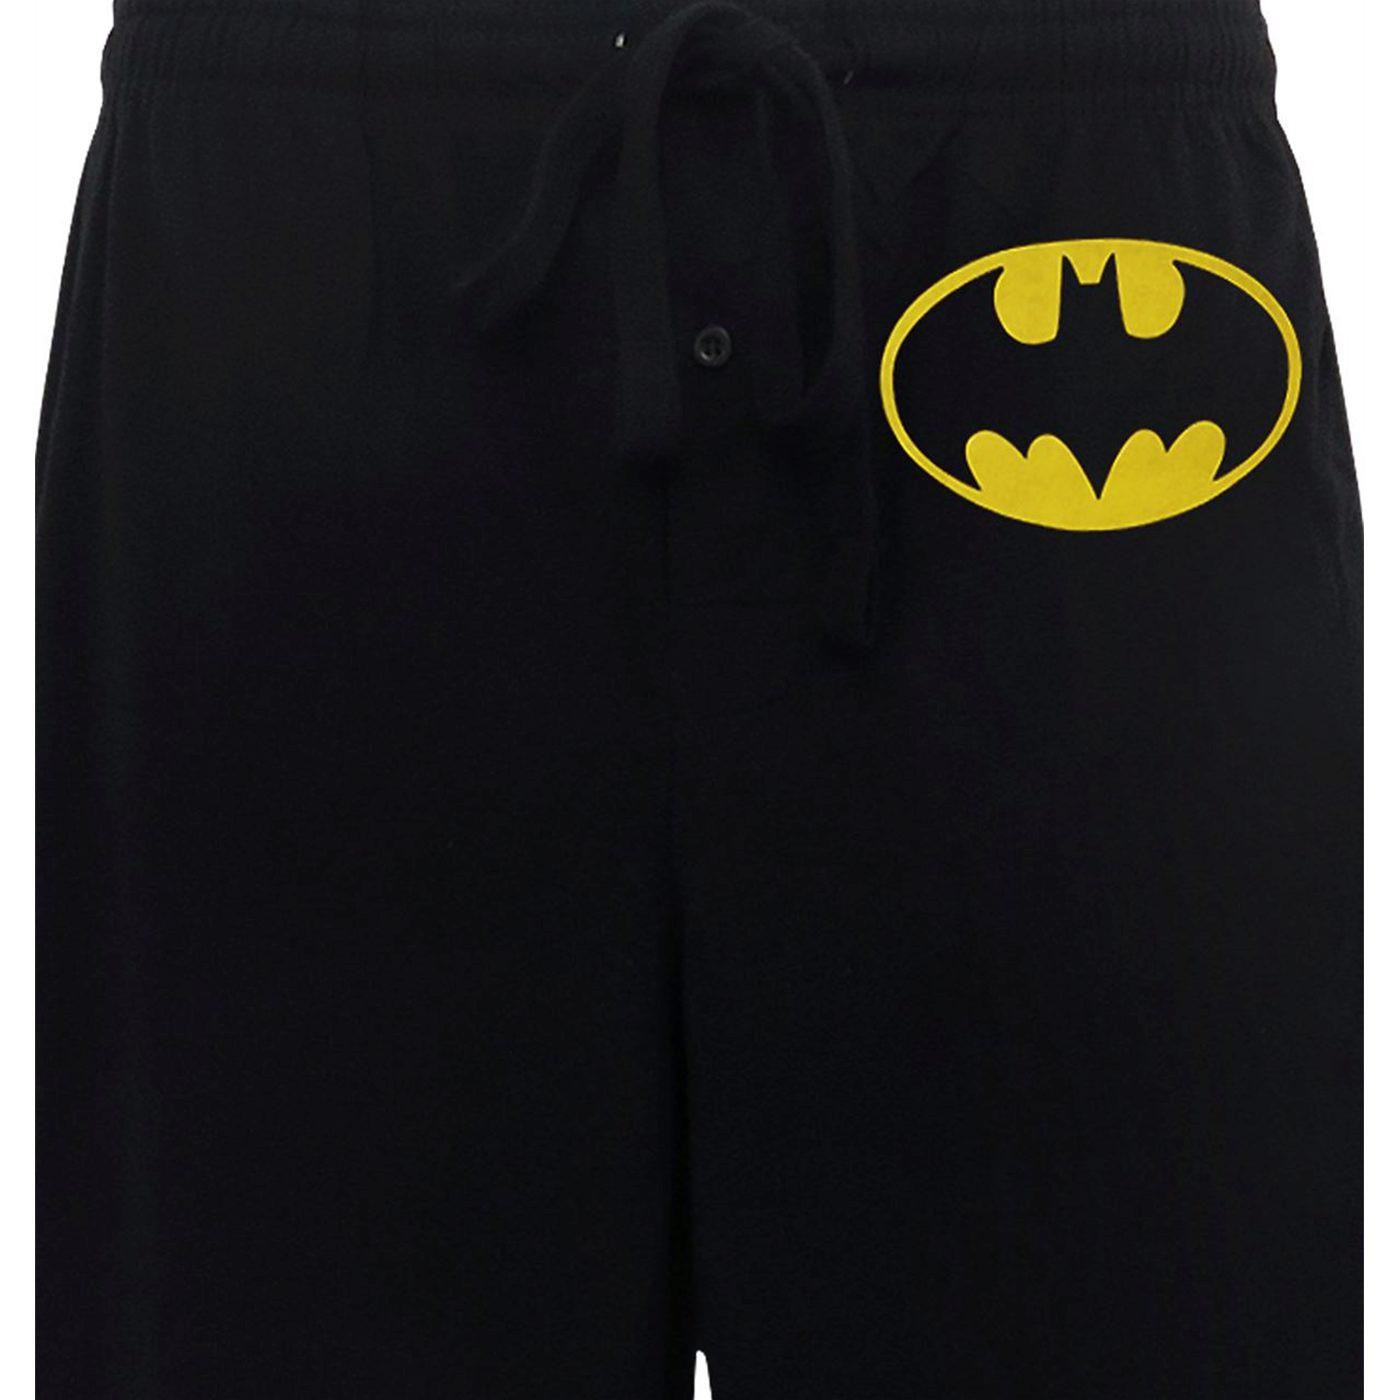 Batman Yellow Symbol Black Sleep Pants